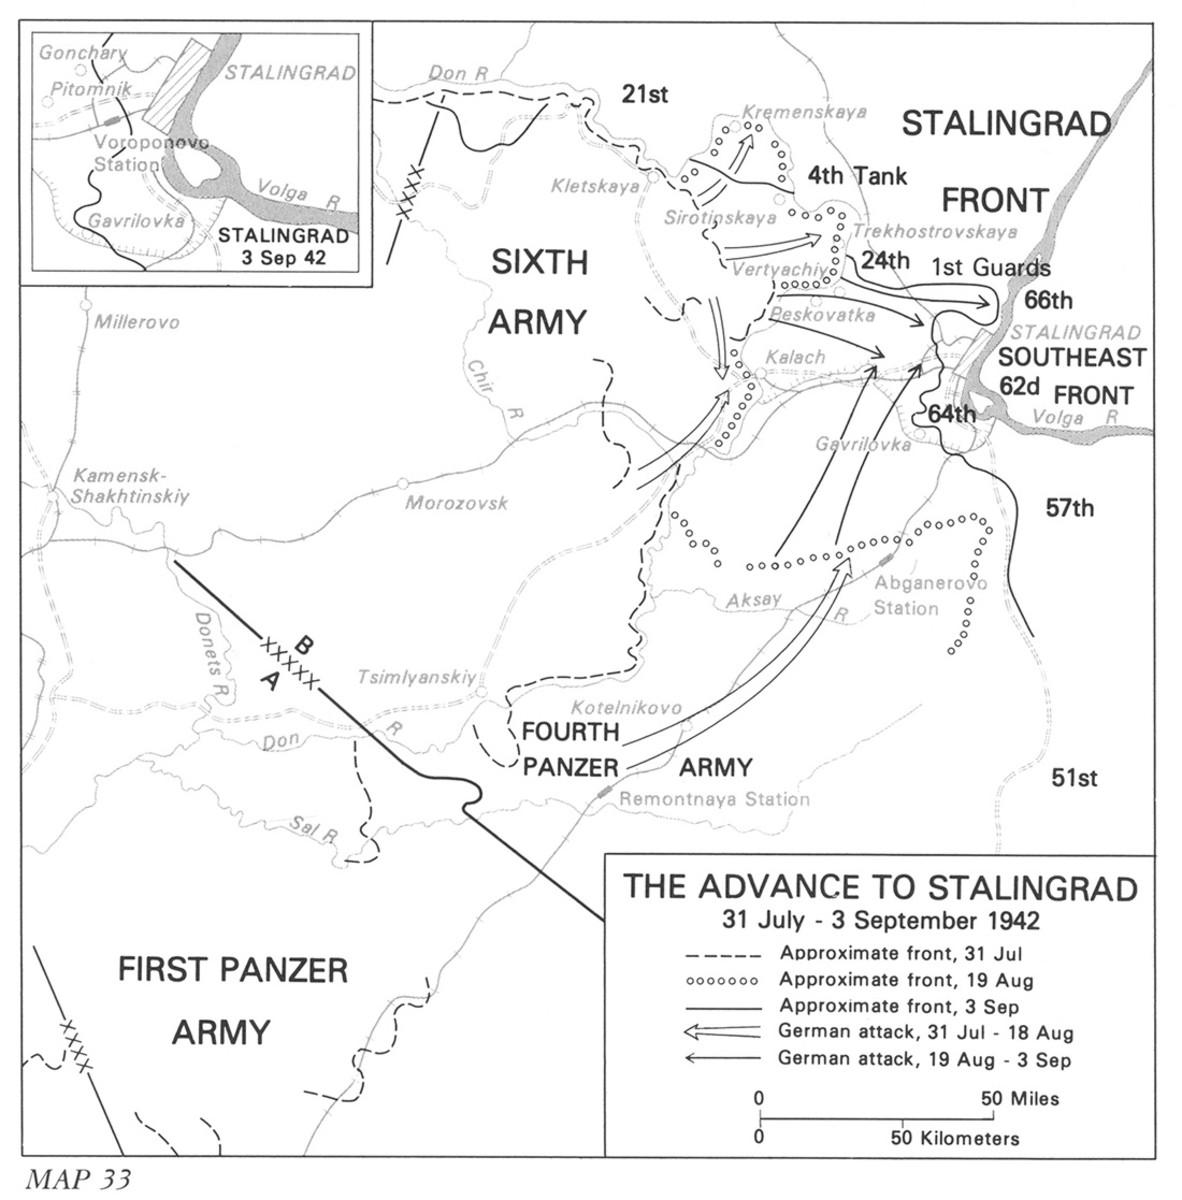 The advance toward Stalingrad summer 1942.